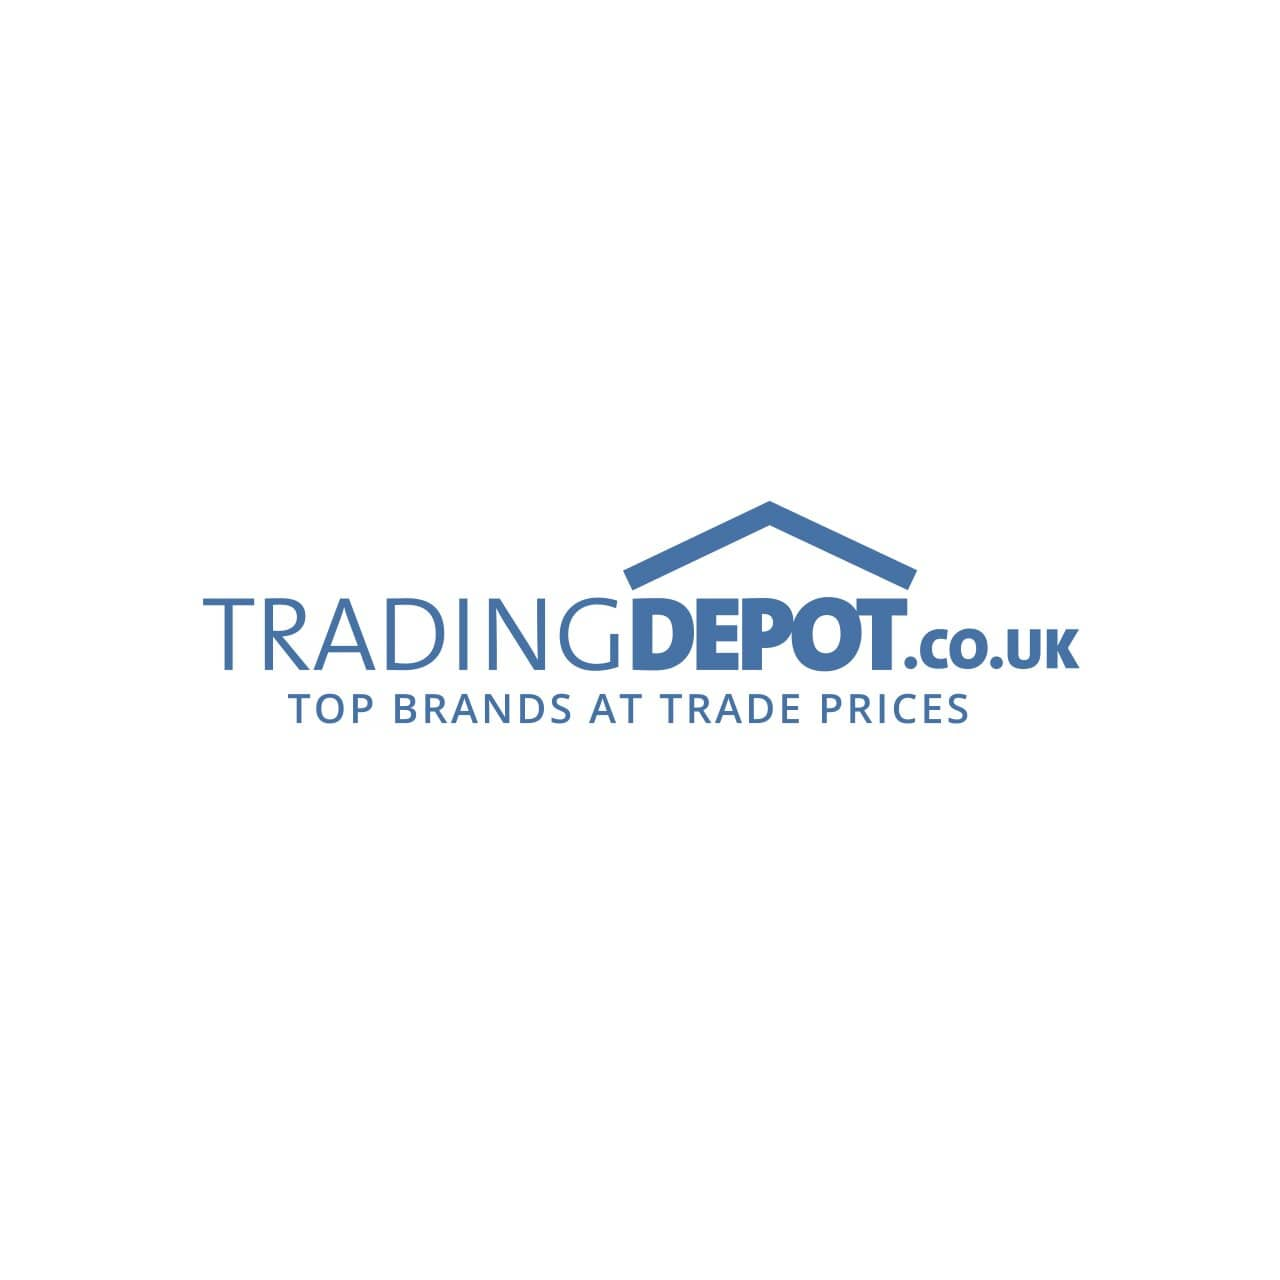 LPD Chigwell Clear Glazed Hardwood M&T Door 838x1981x44mm - MTCHICGDG33